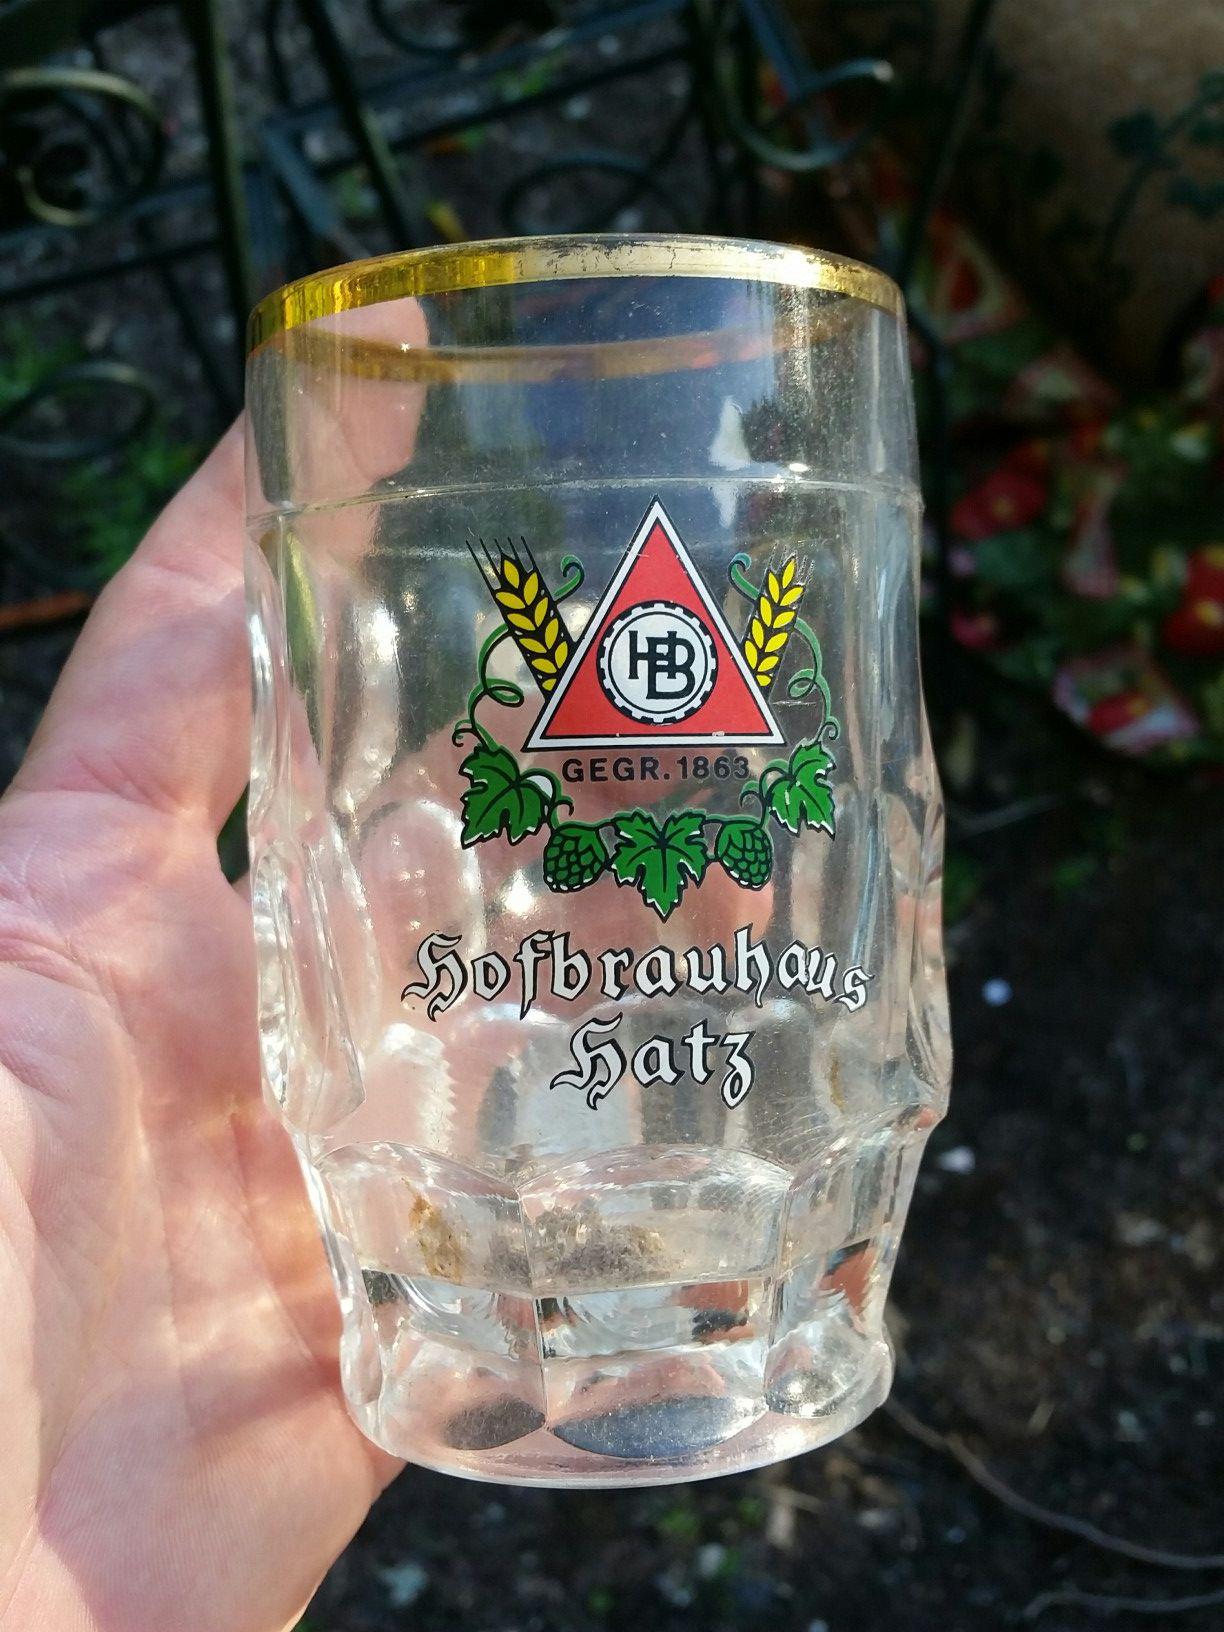 Some kind of old beer advertising mug